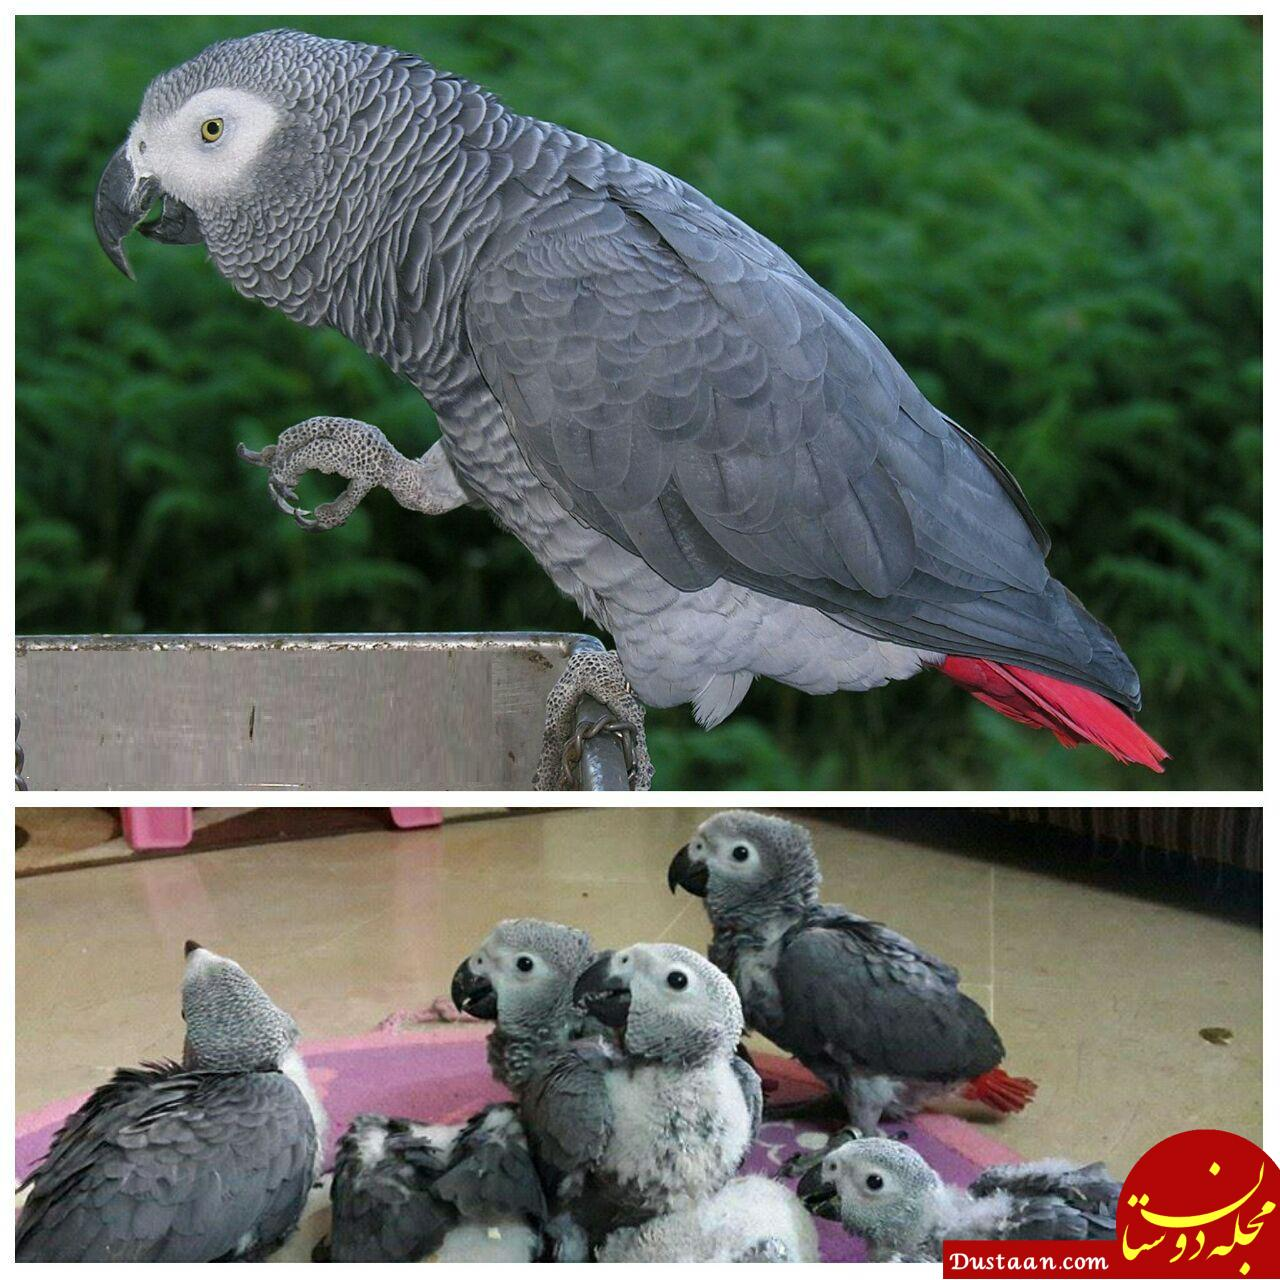 www.dustaan.com اگر با ناز و عشوه حرف بزند 7 میلیون تومان! +عکس